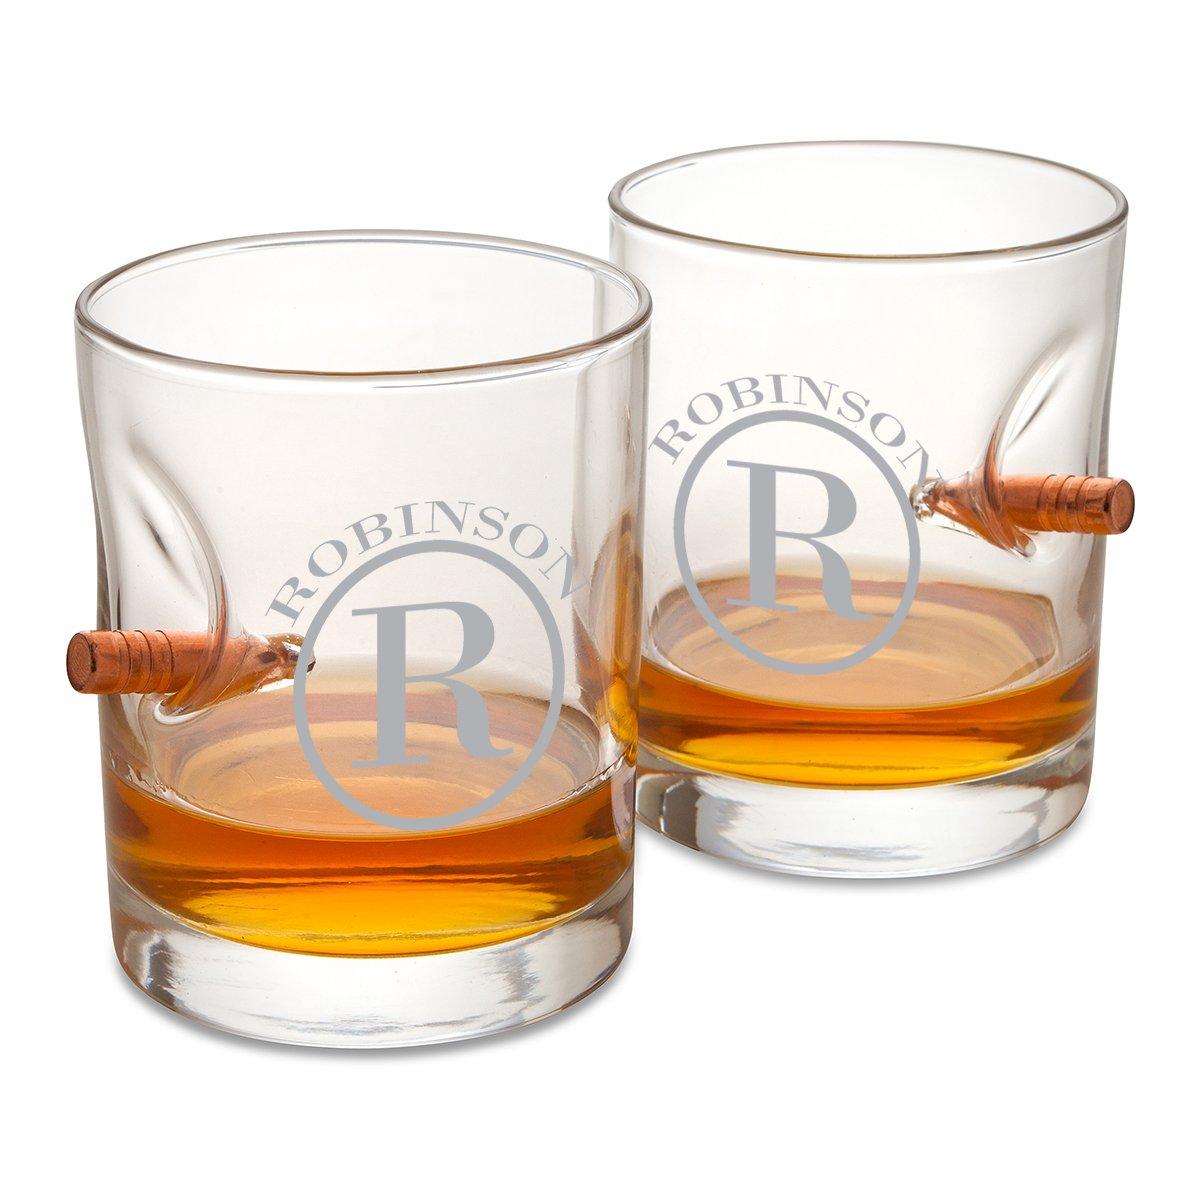 Personalized Bulletproof Whiskey Glasses - Whiskey Glass Set - circle monogram